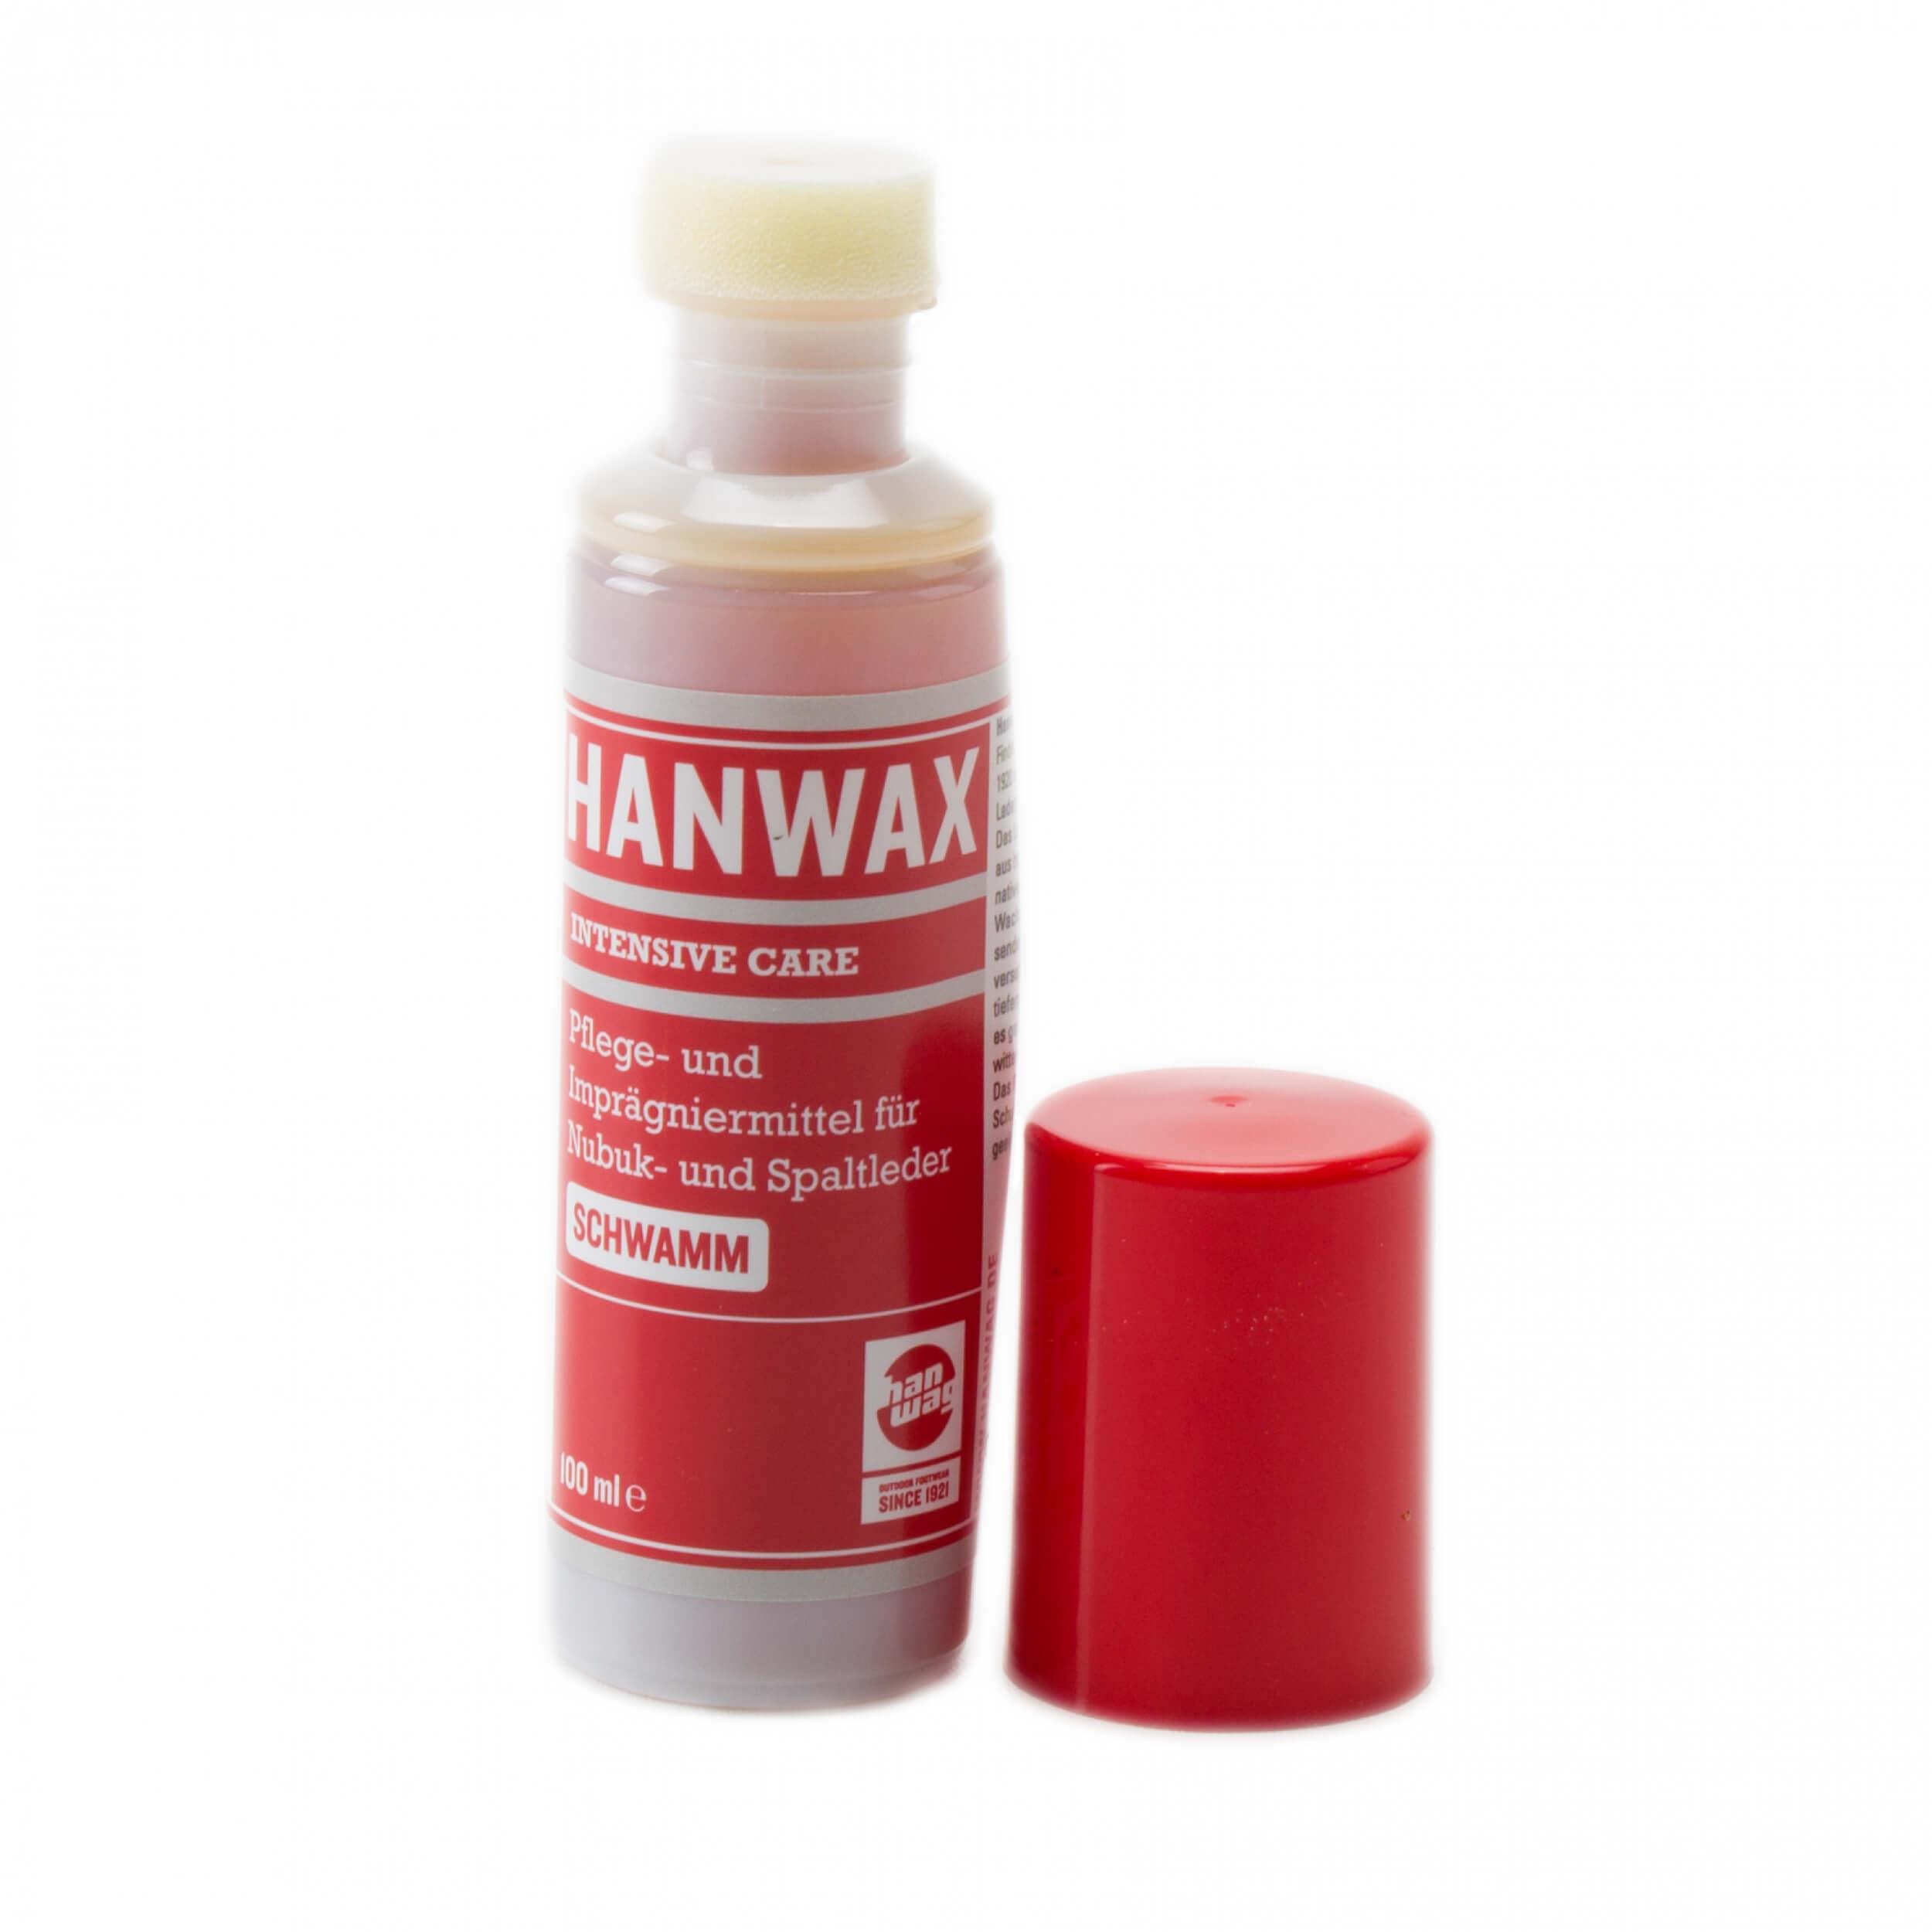 Hanwag Hanwax Intensive Care